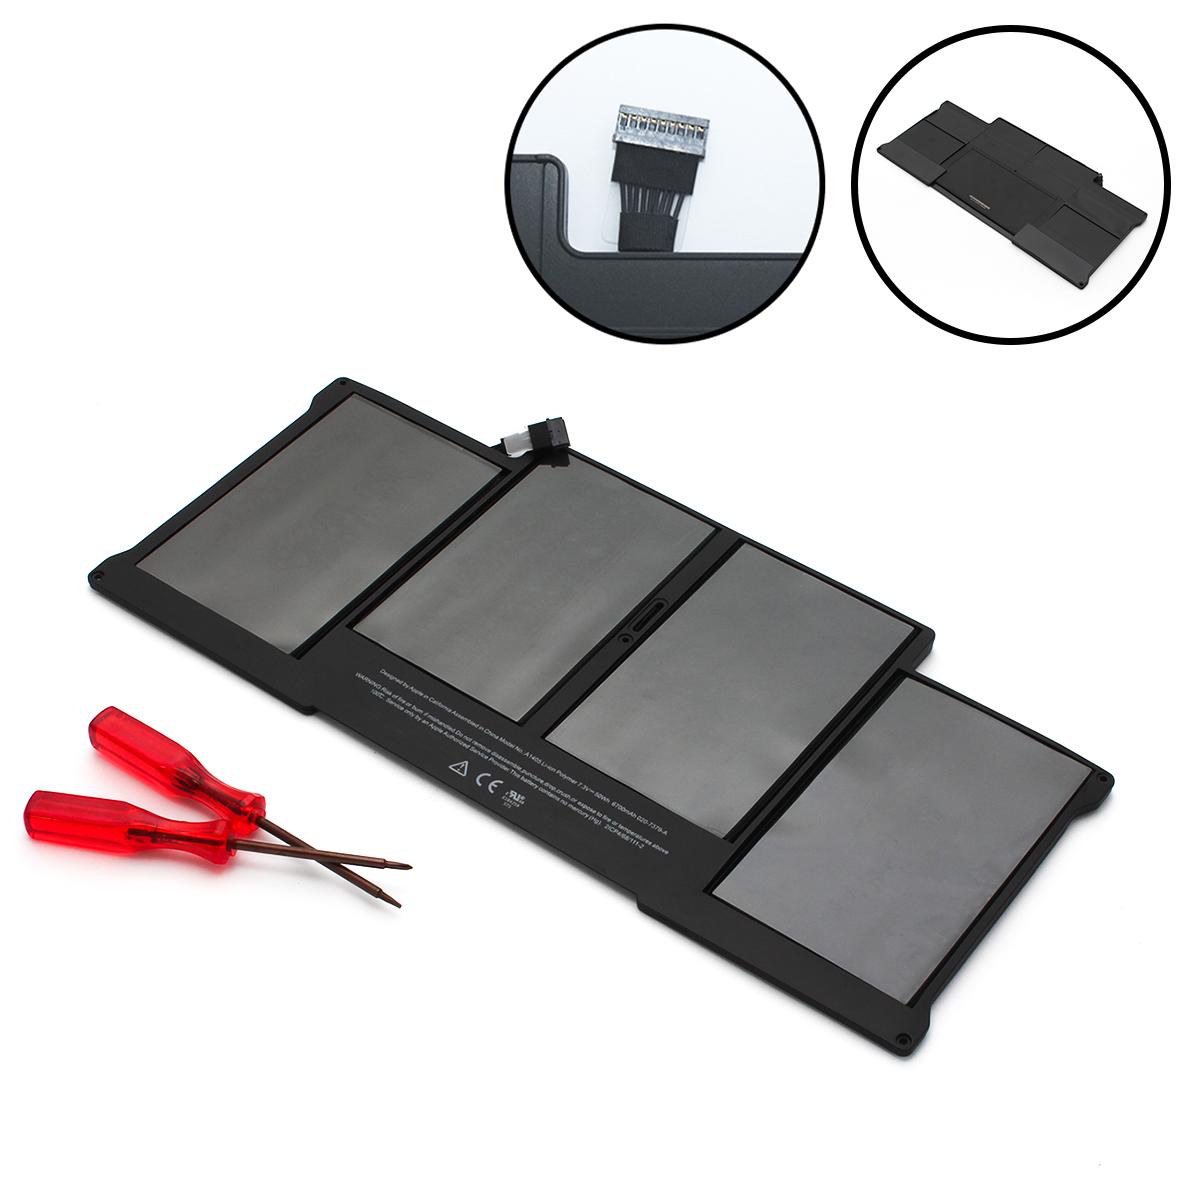 батарея для macbook air 13 2011, 2012 a1405, батарея для a1466 a1369 2011-2012 года